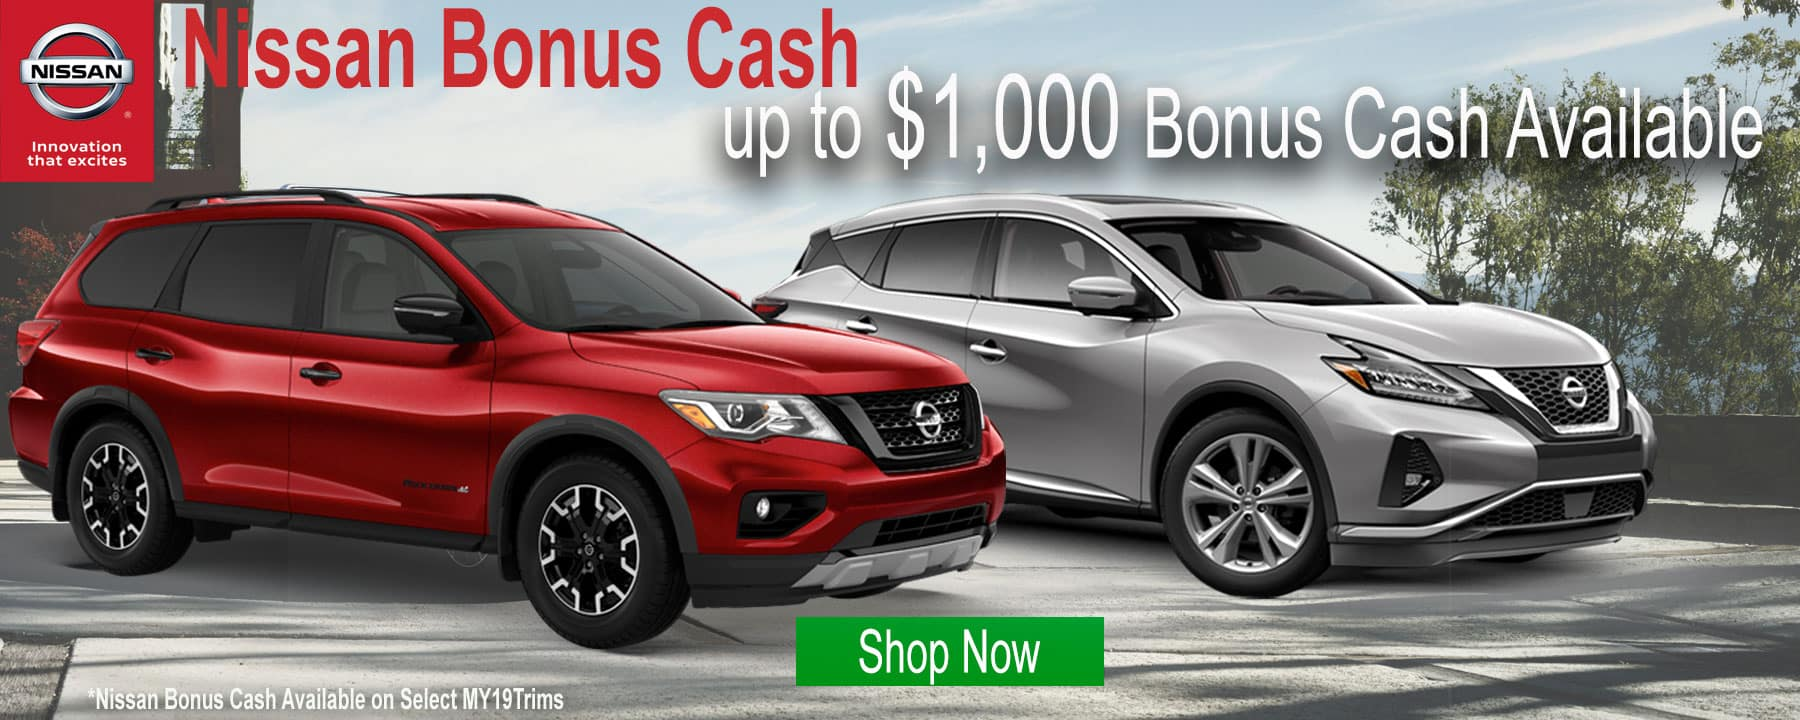 Bonus Cash Available on 2019 Nissan Pathfinder and 2019 Nissan Murano!